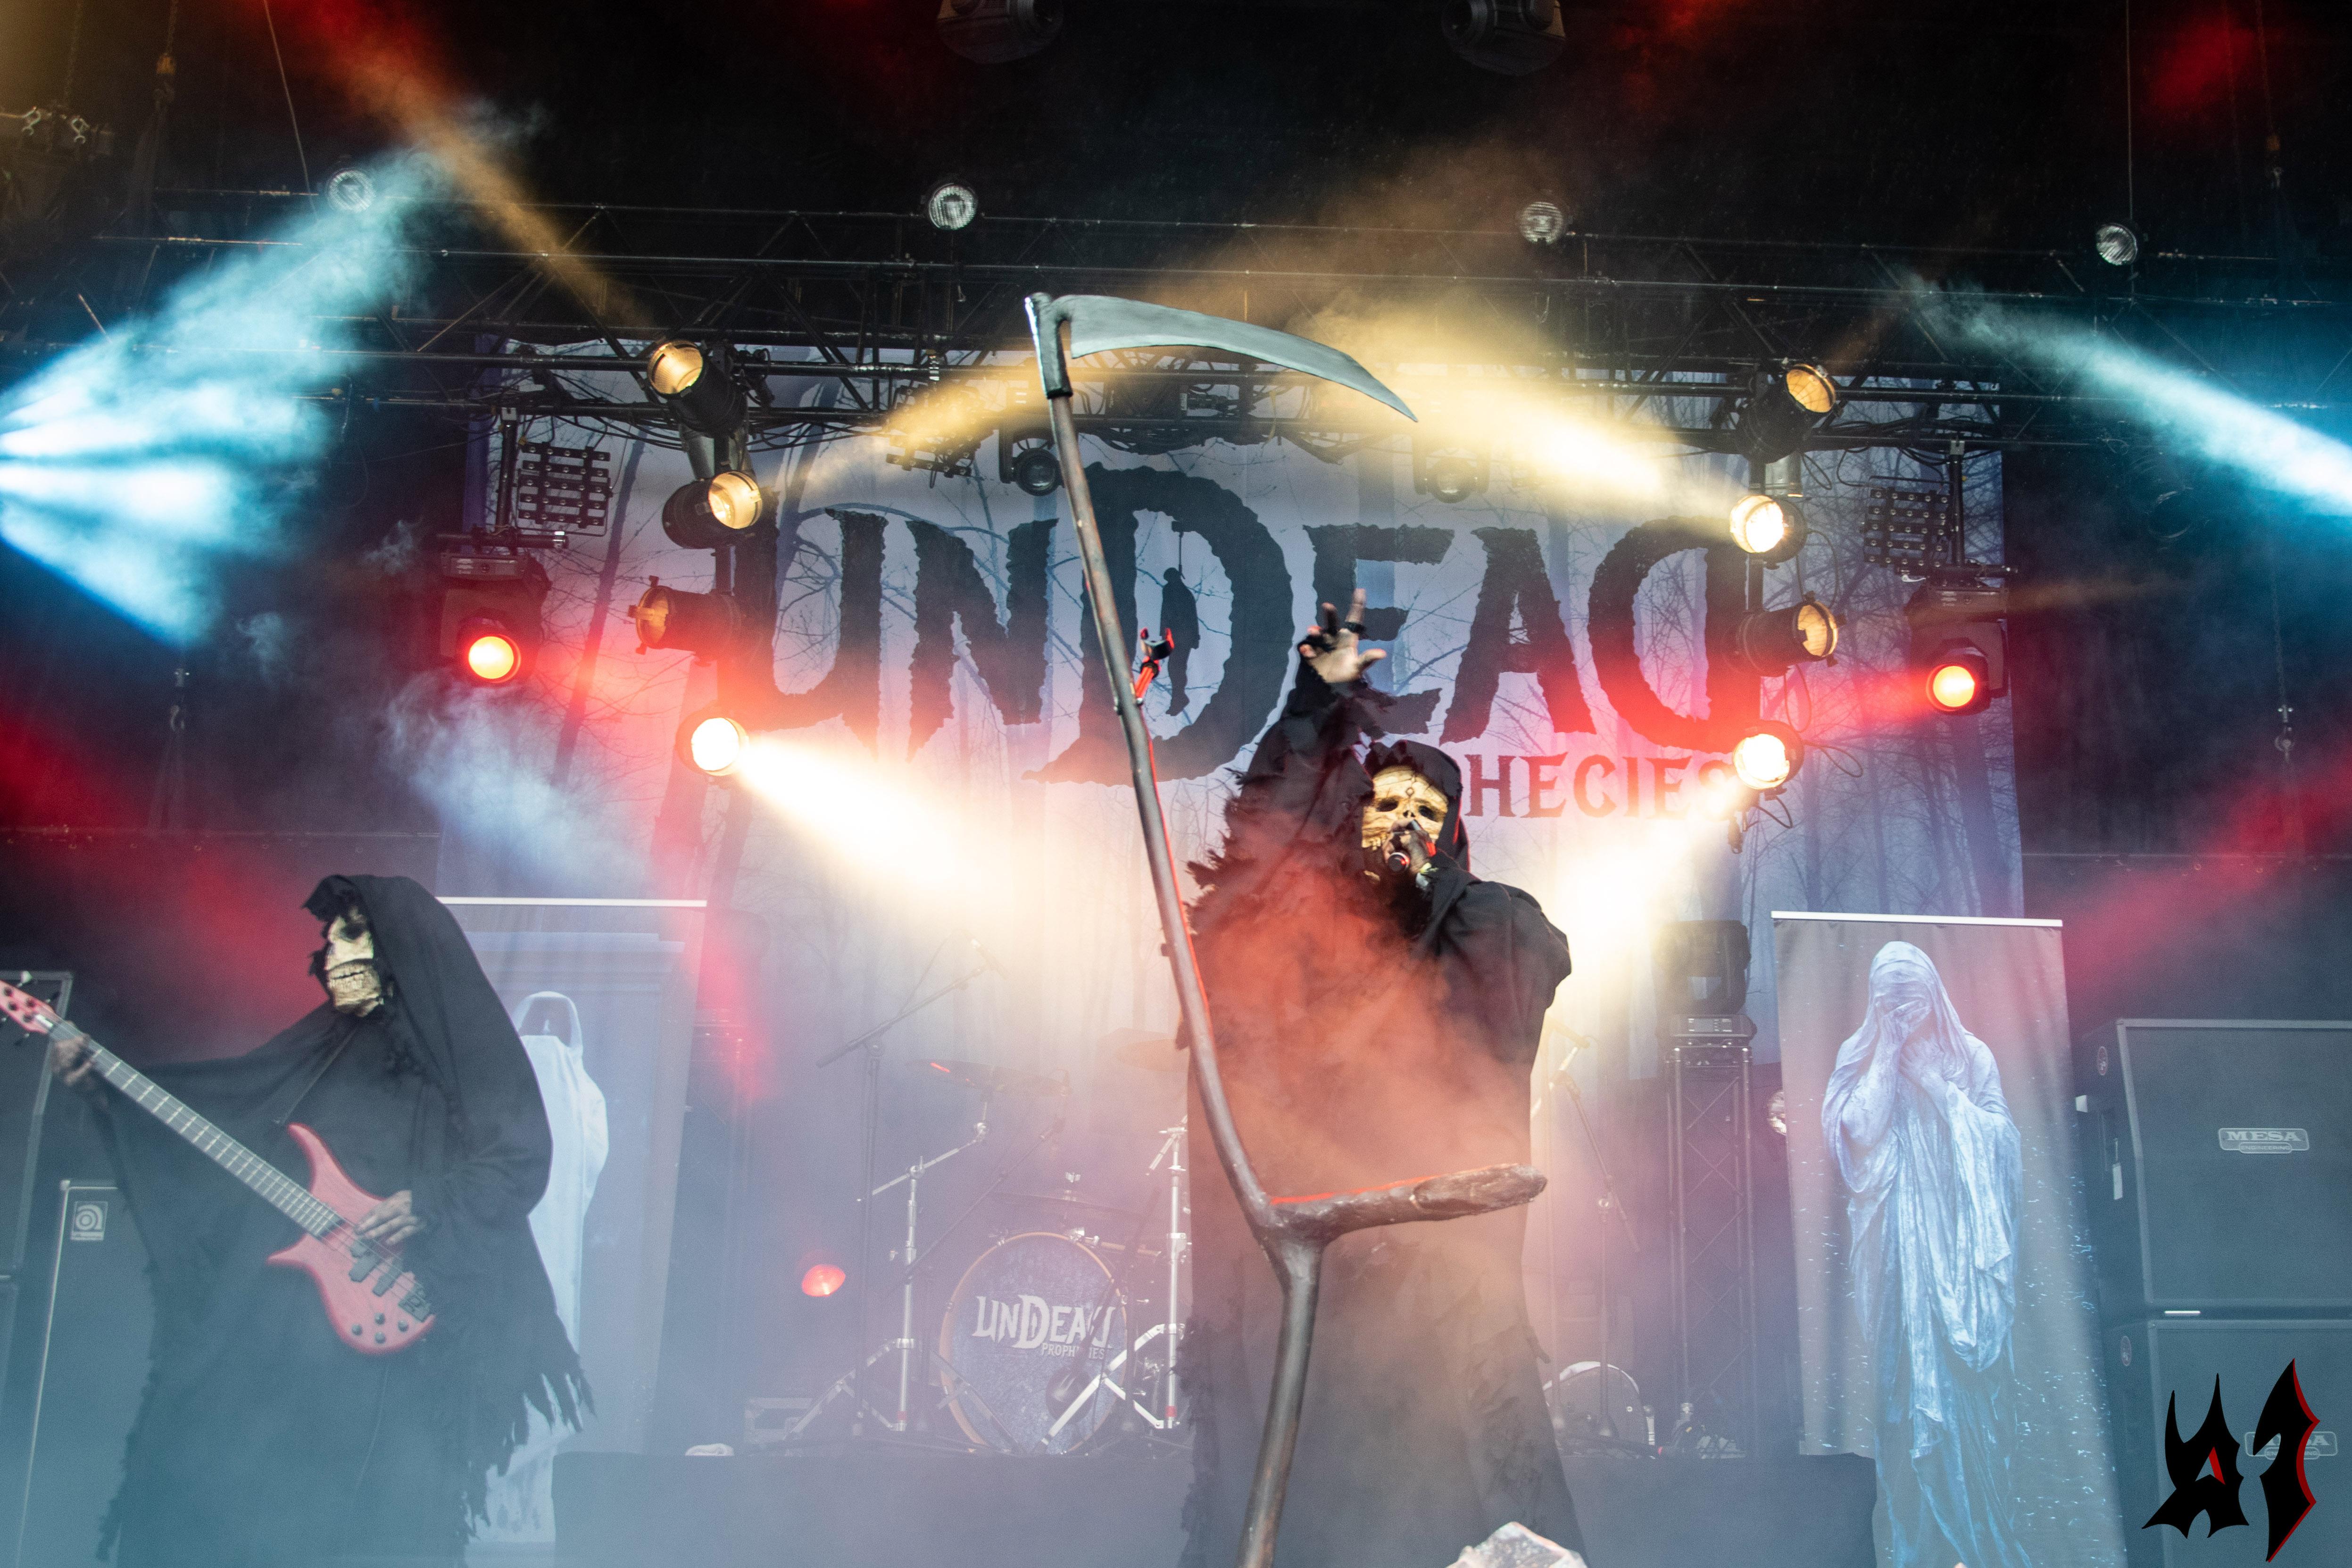 Motocultor - Undead Prophecies - 12